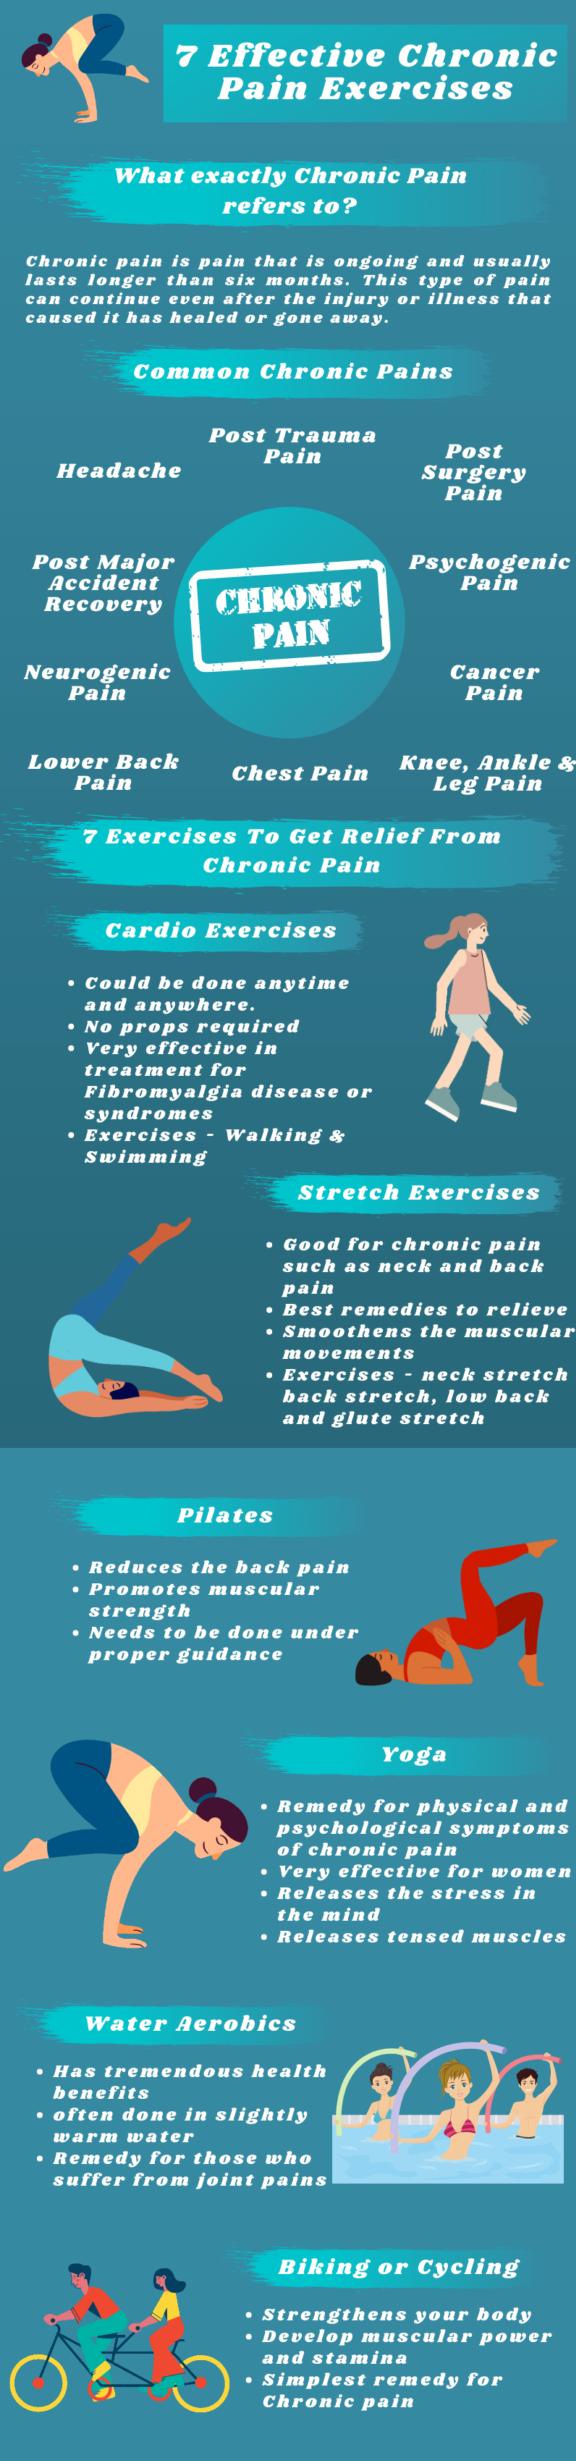 exercise for chronic pain